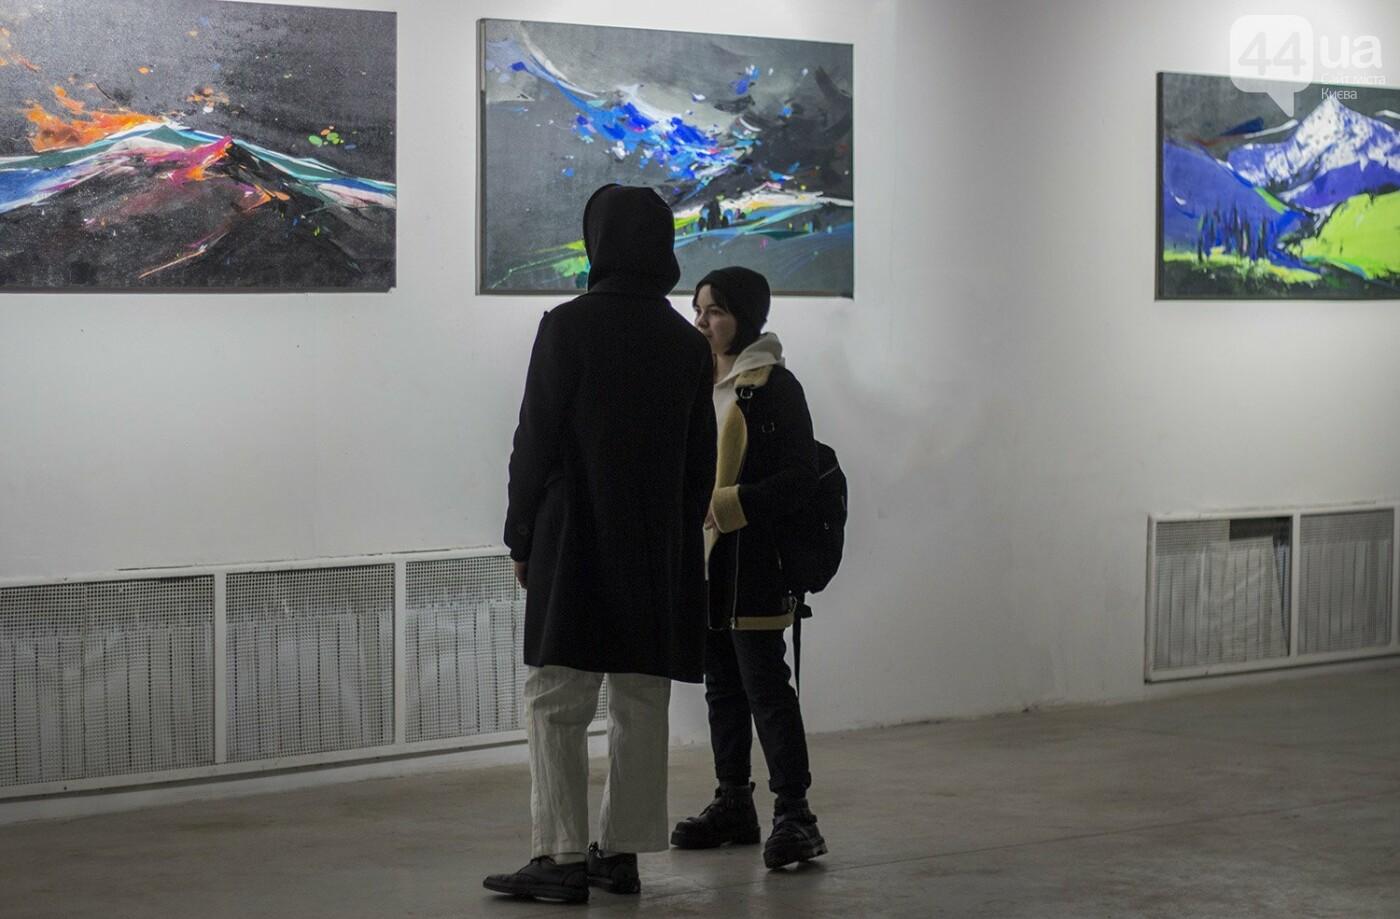 В центре Киева показали 3D-шоу , фото-11